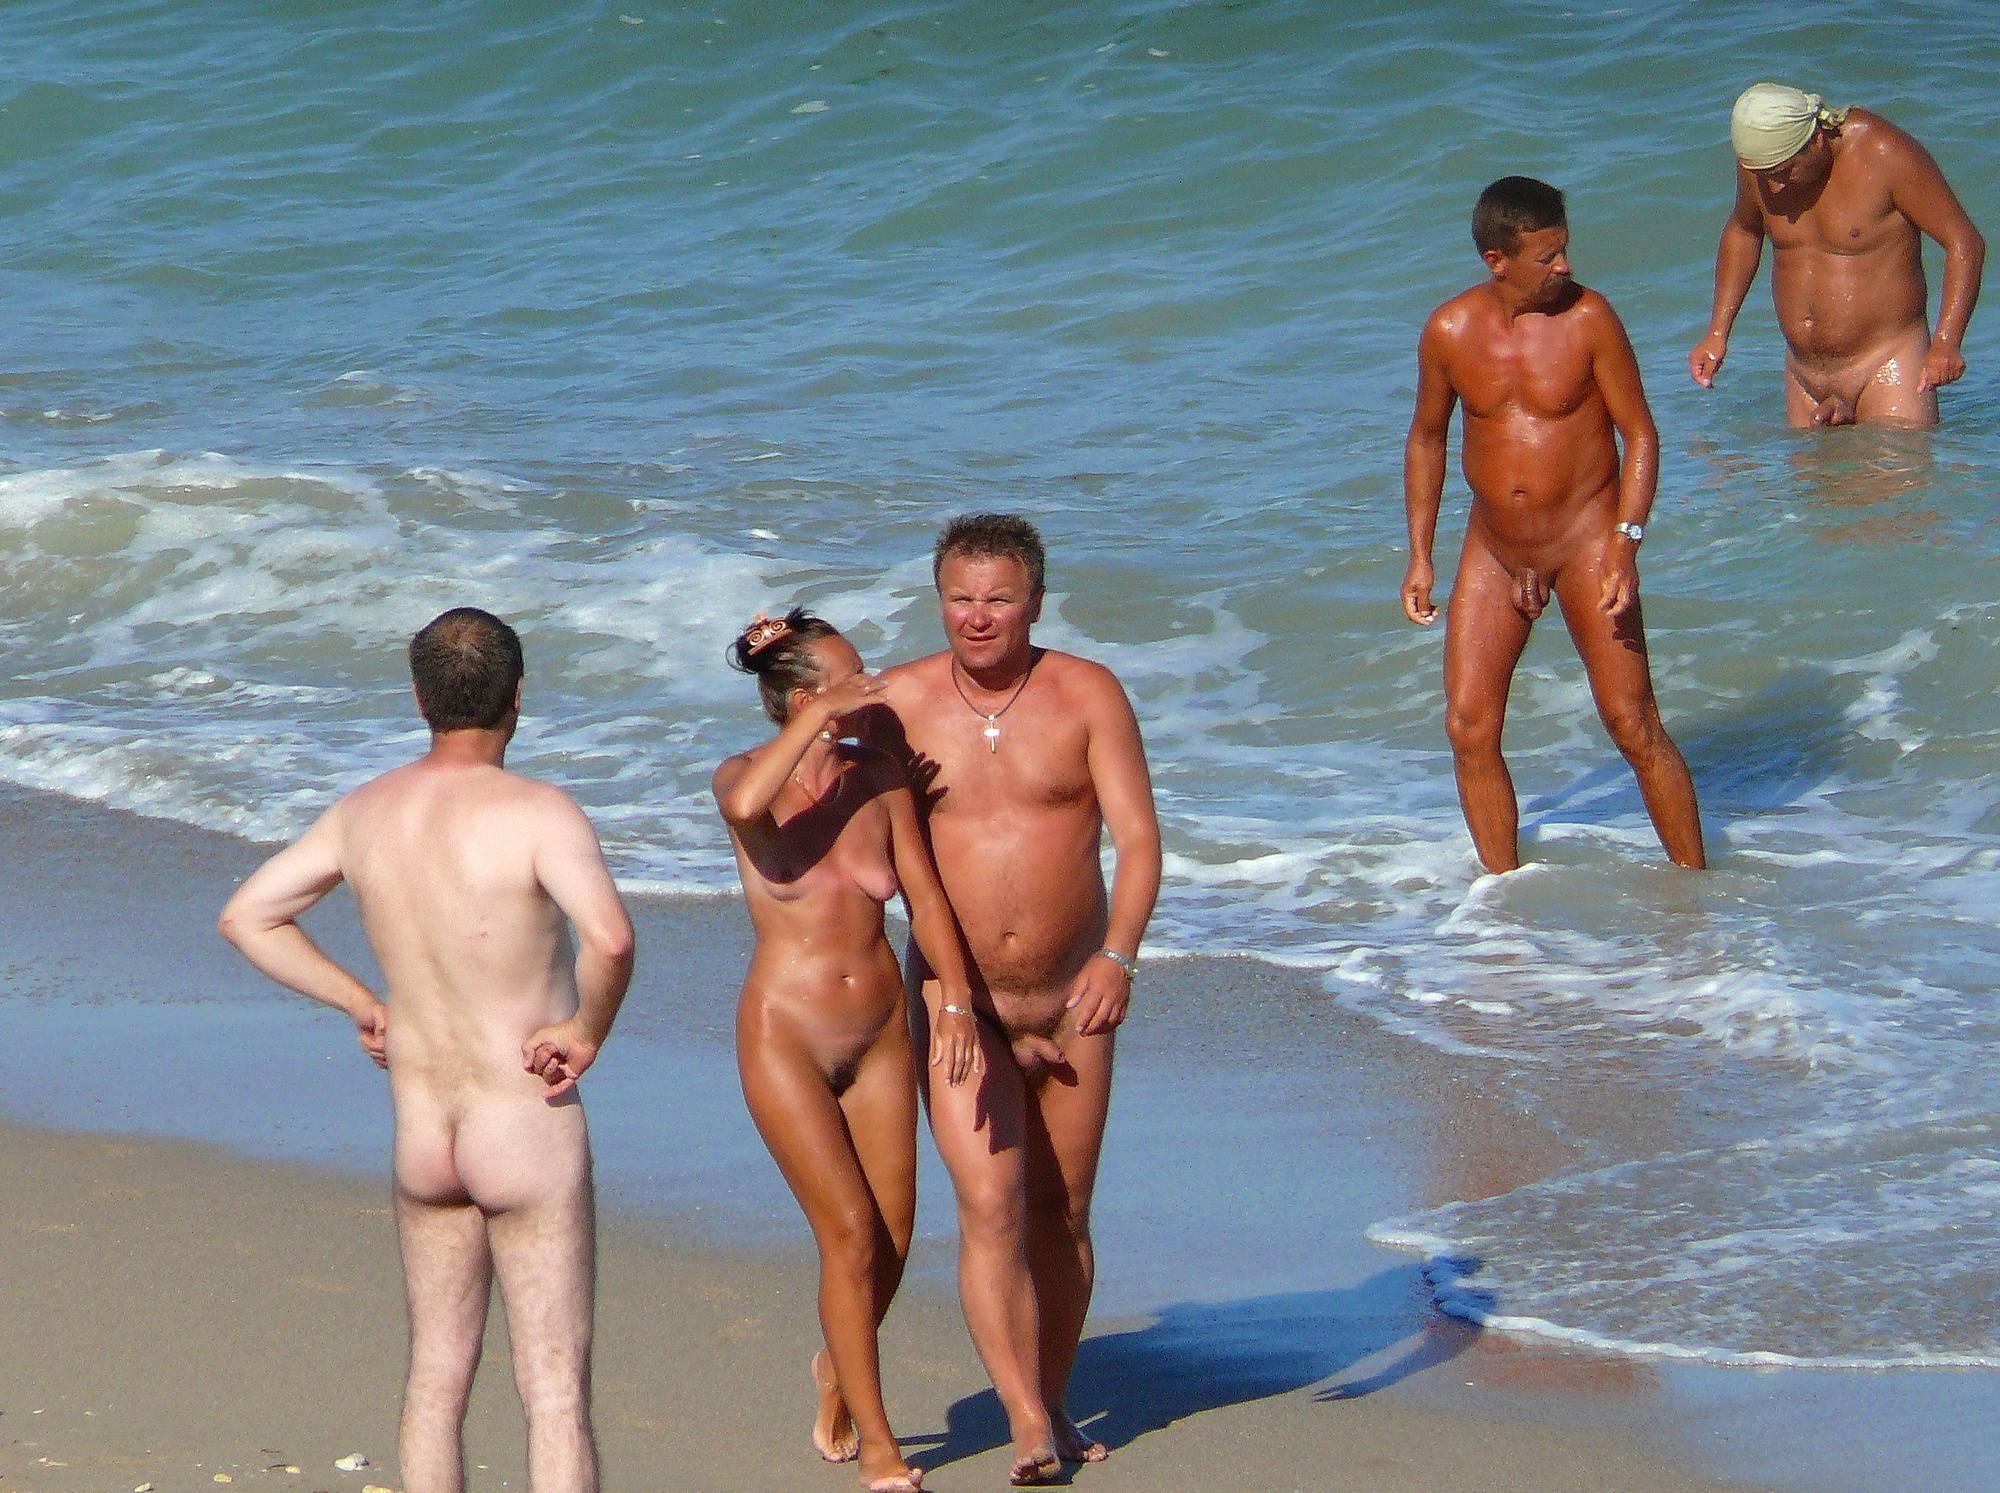 Romanian Beach Waters - 2